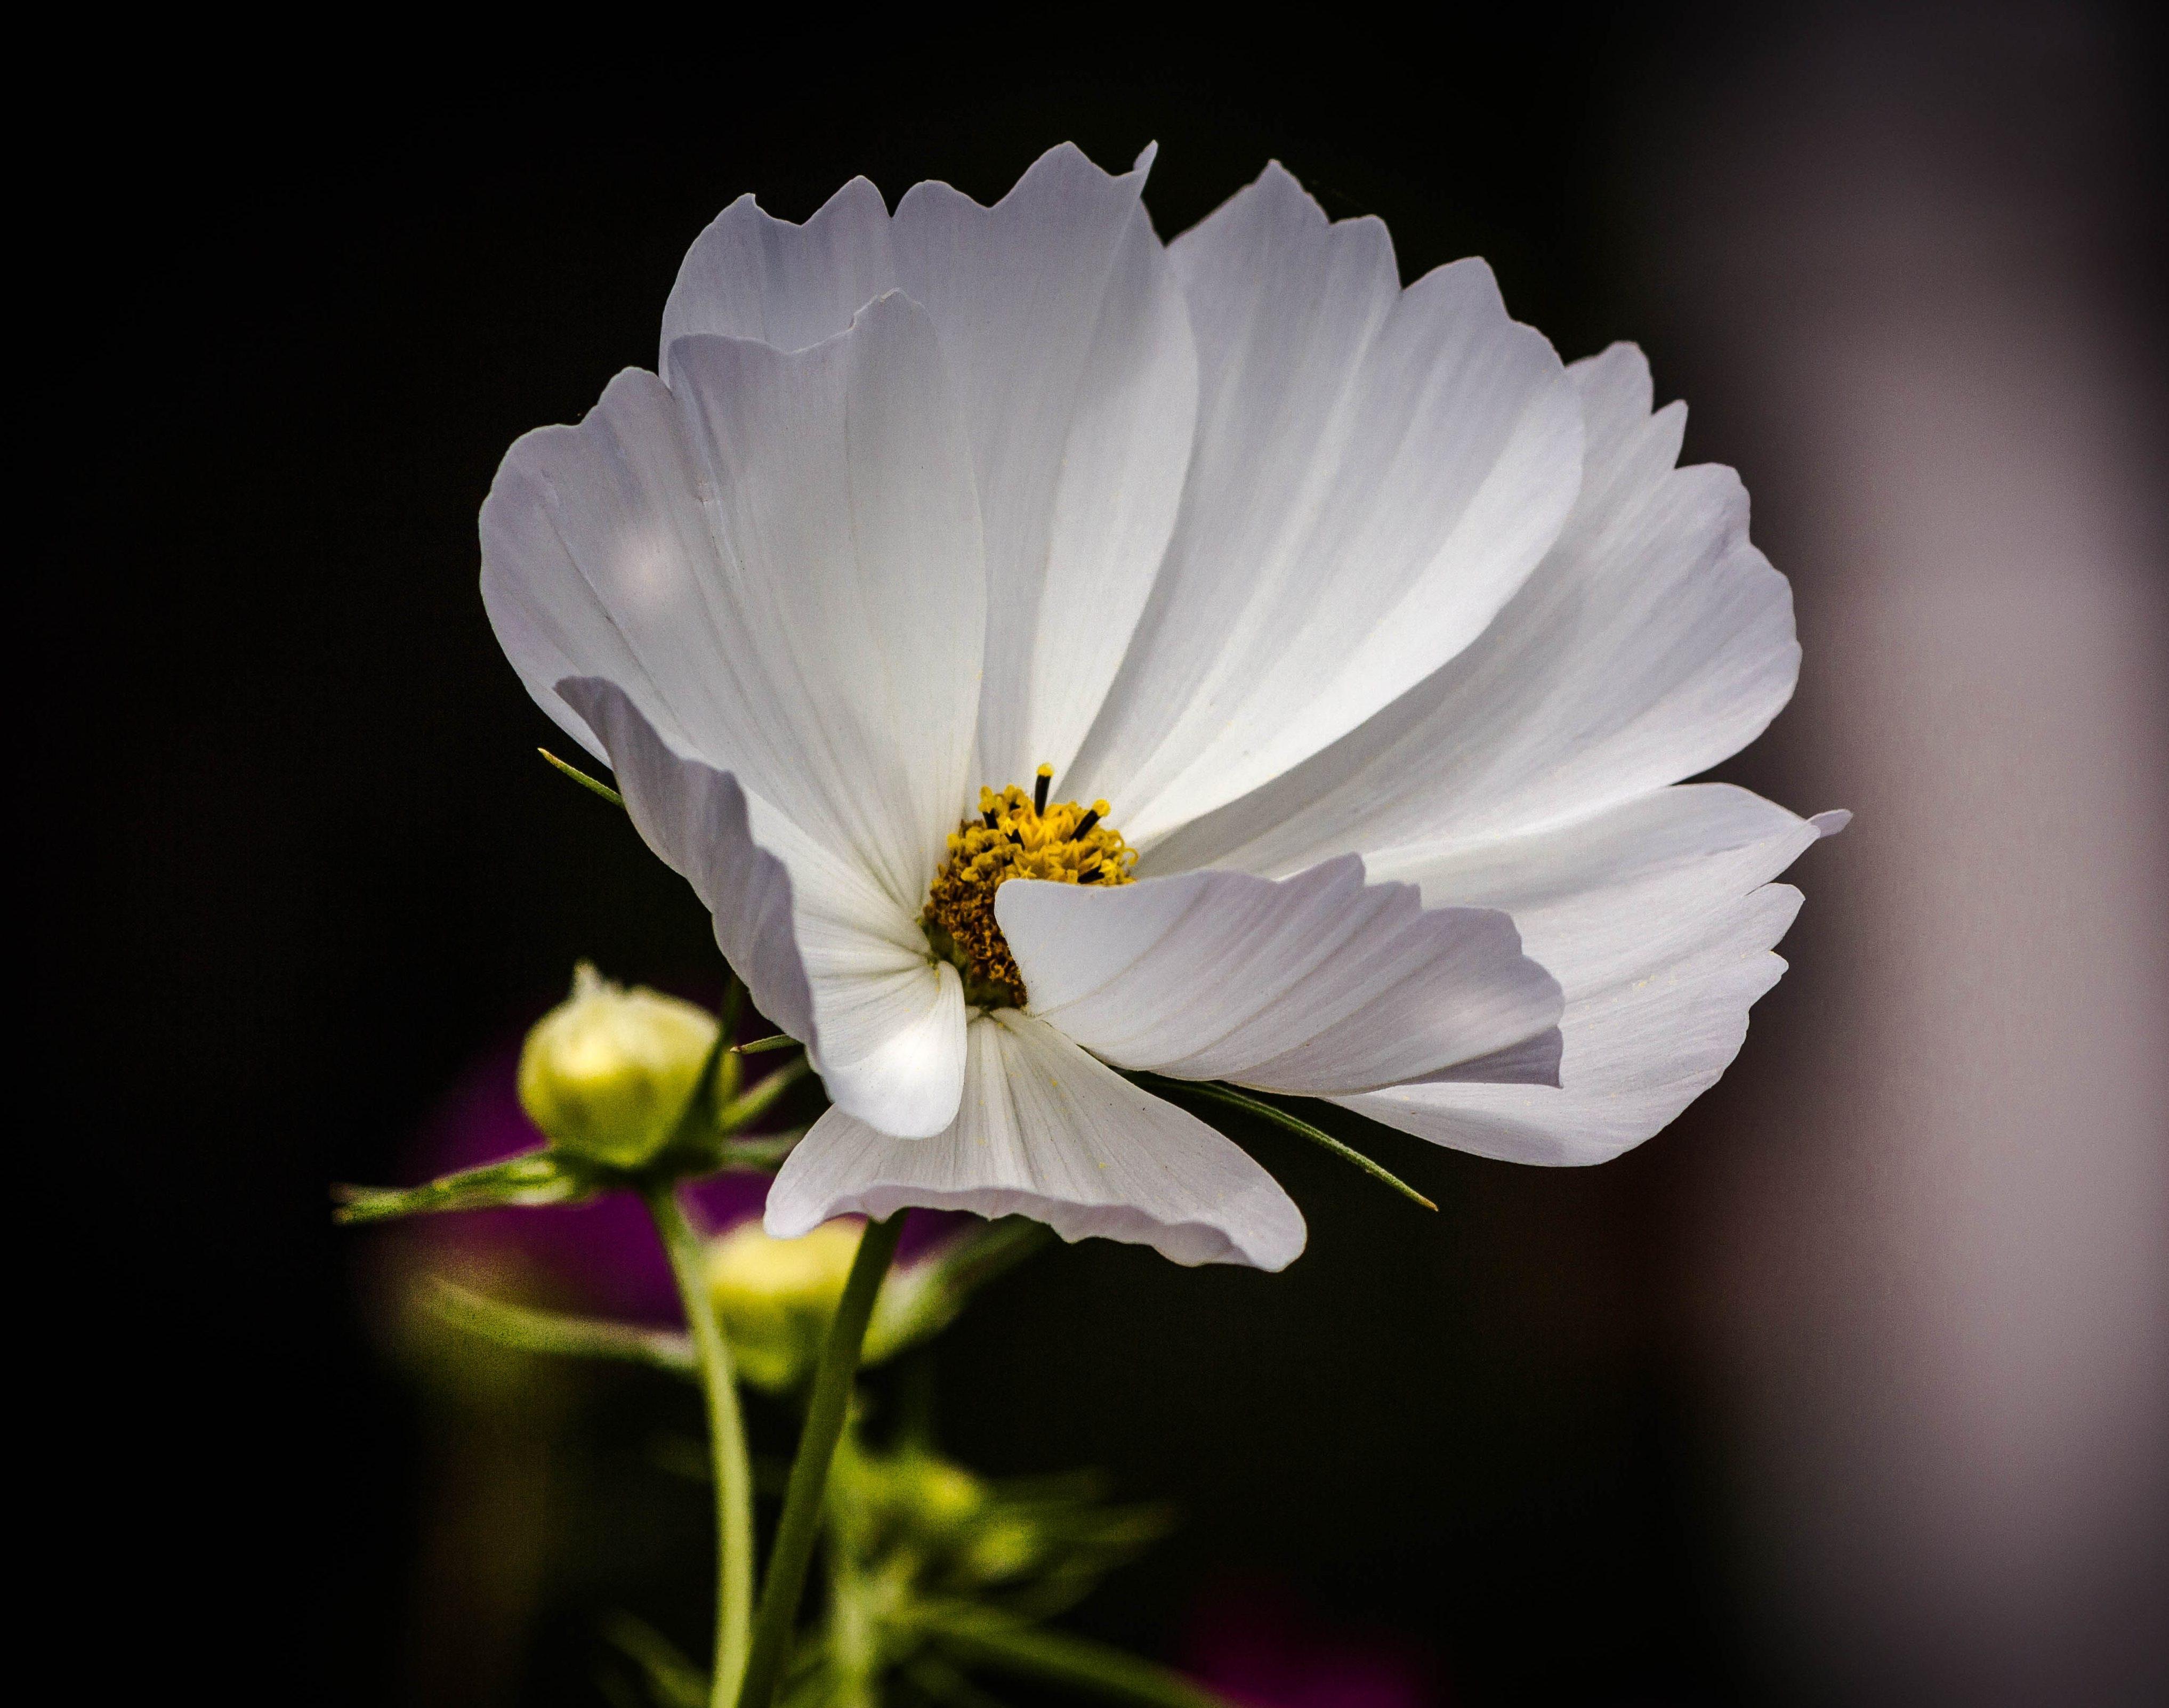 Free Images Nature Blossom Petal Pollen Flora White Flower